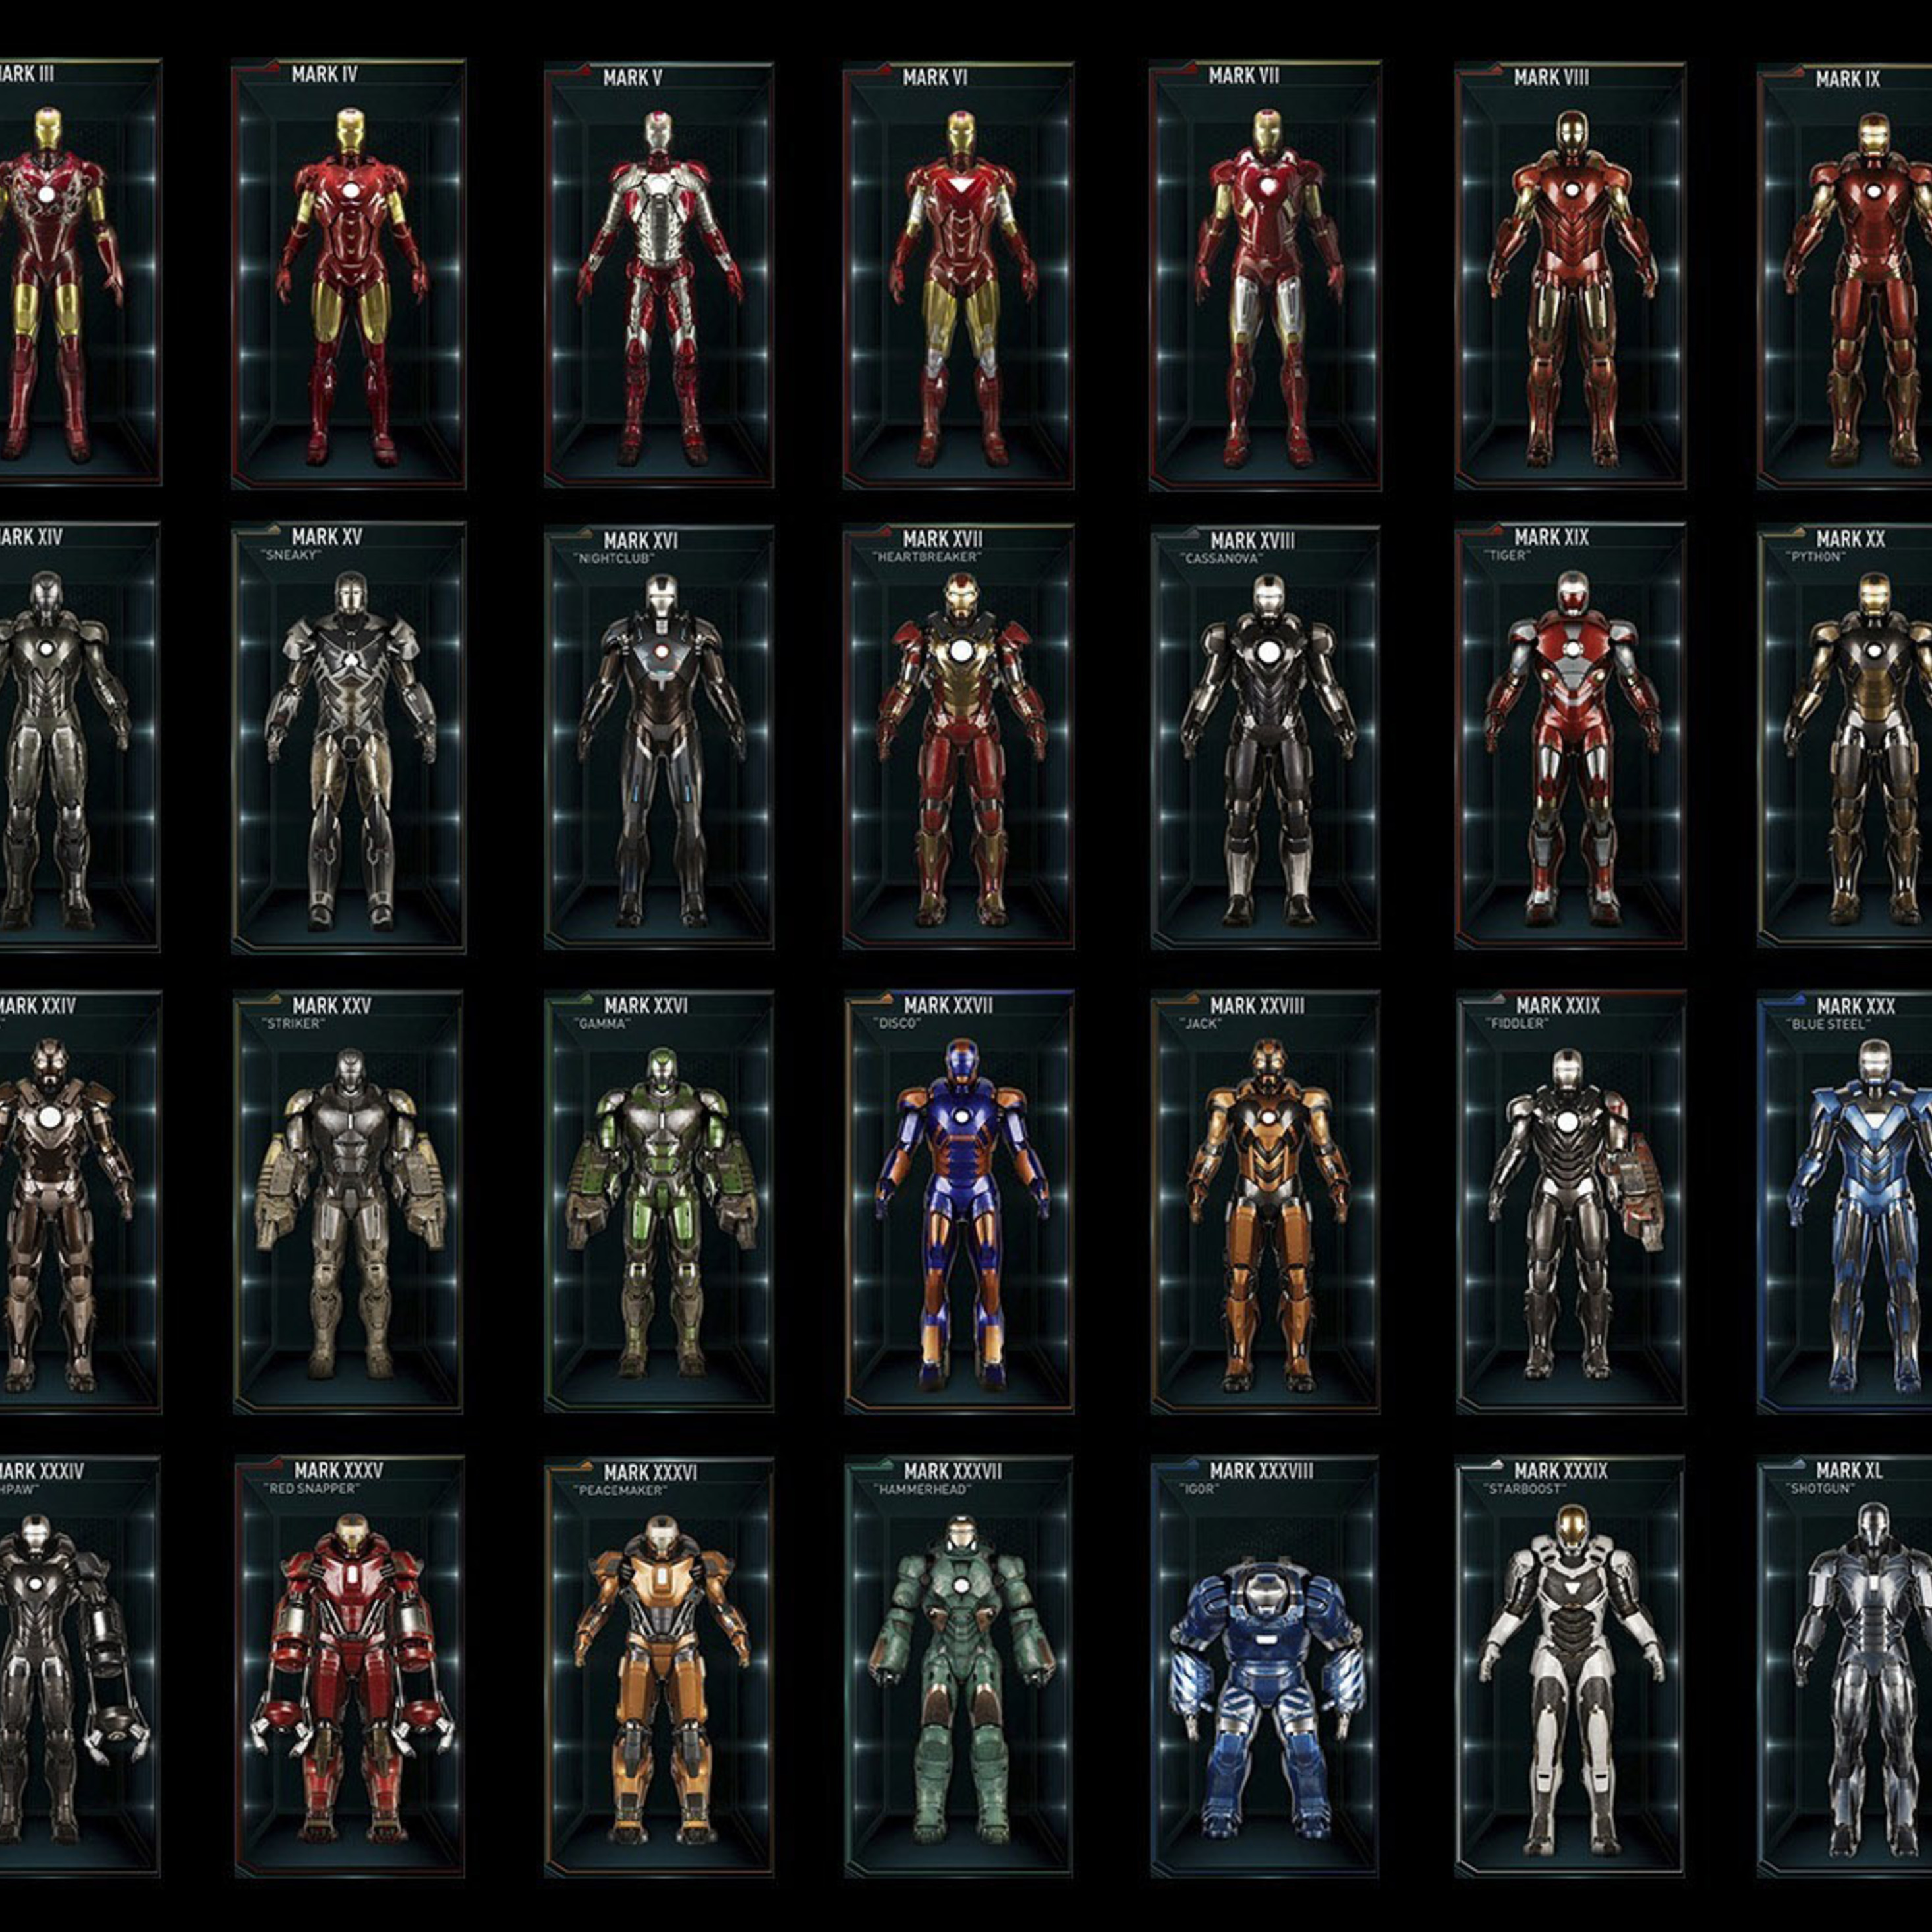 2932x2932 all iron man suits ipad pro retina display hd 4k for Sfondi iron man